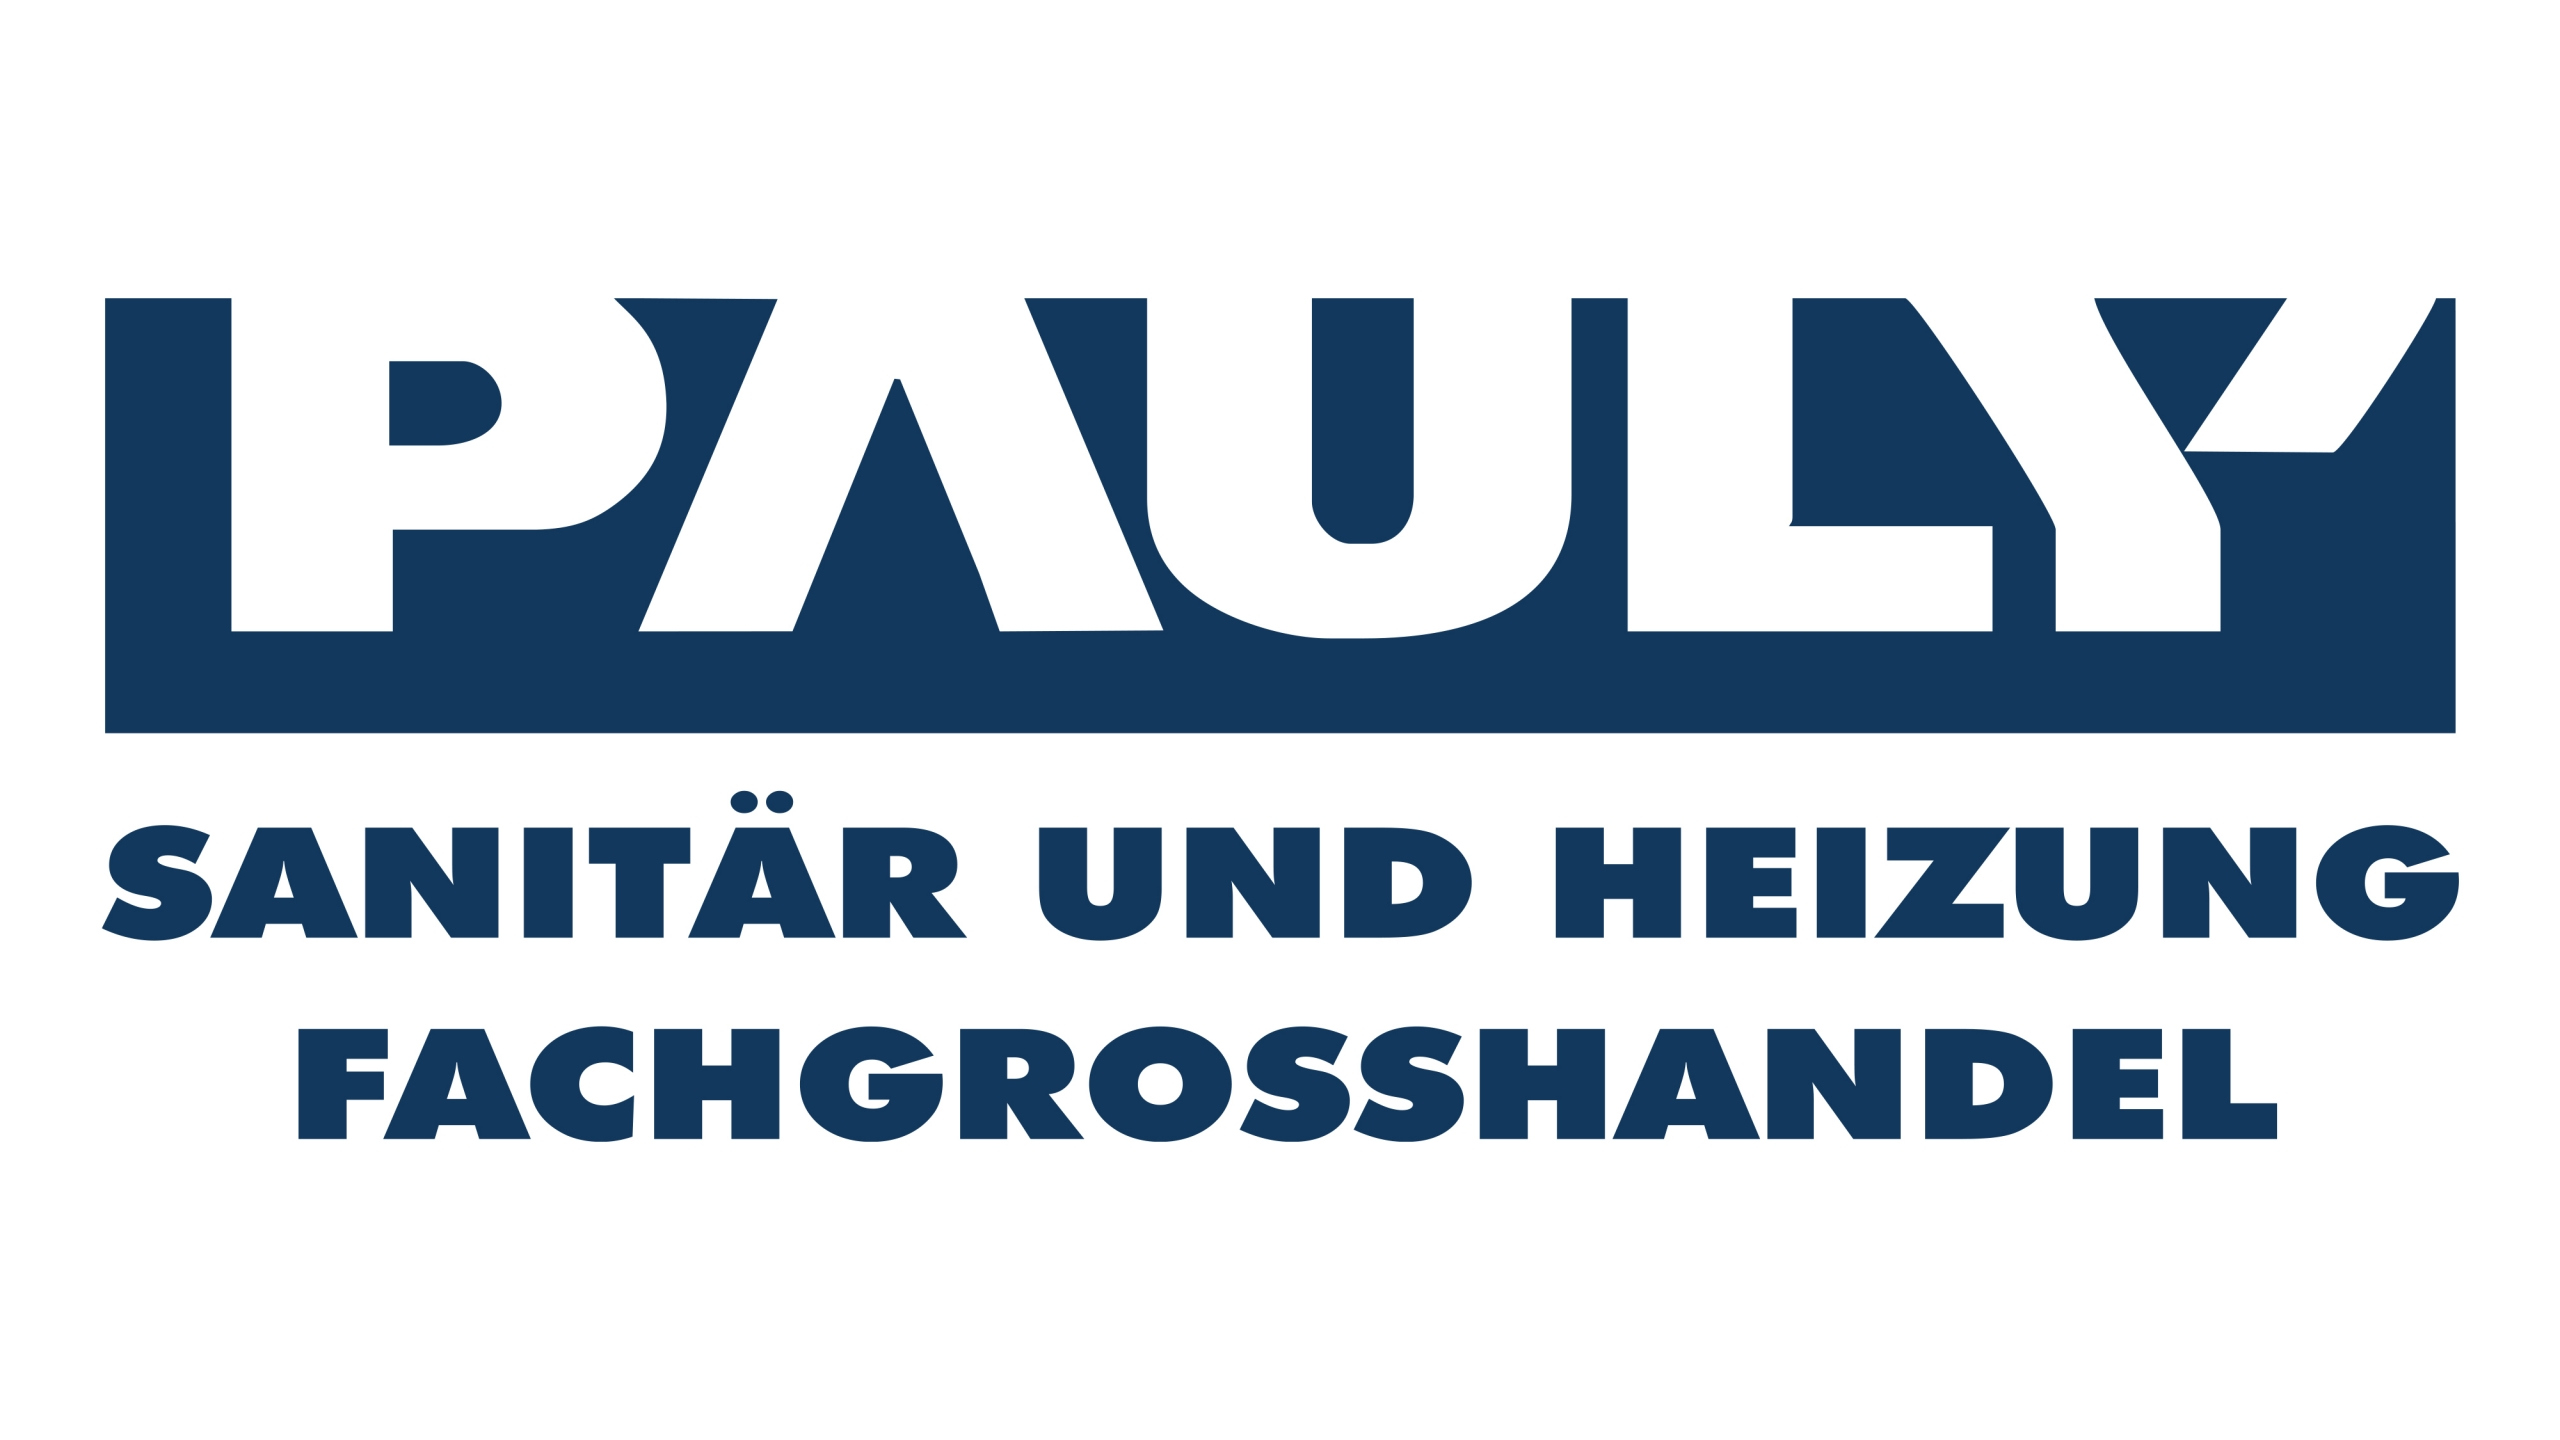 Pauly Sanitär und Heizung Fachgroßhandel